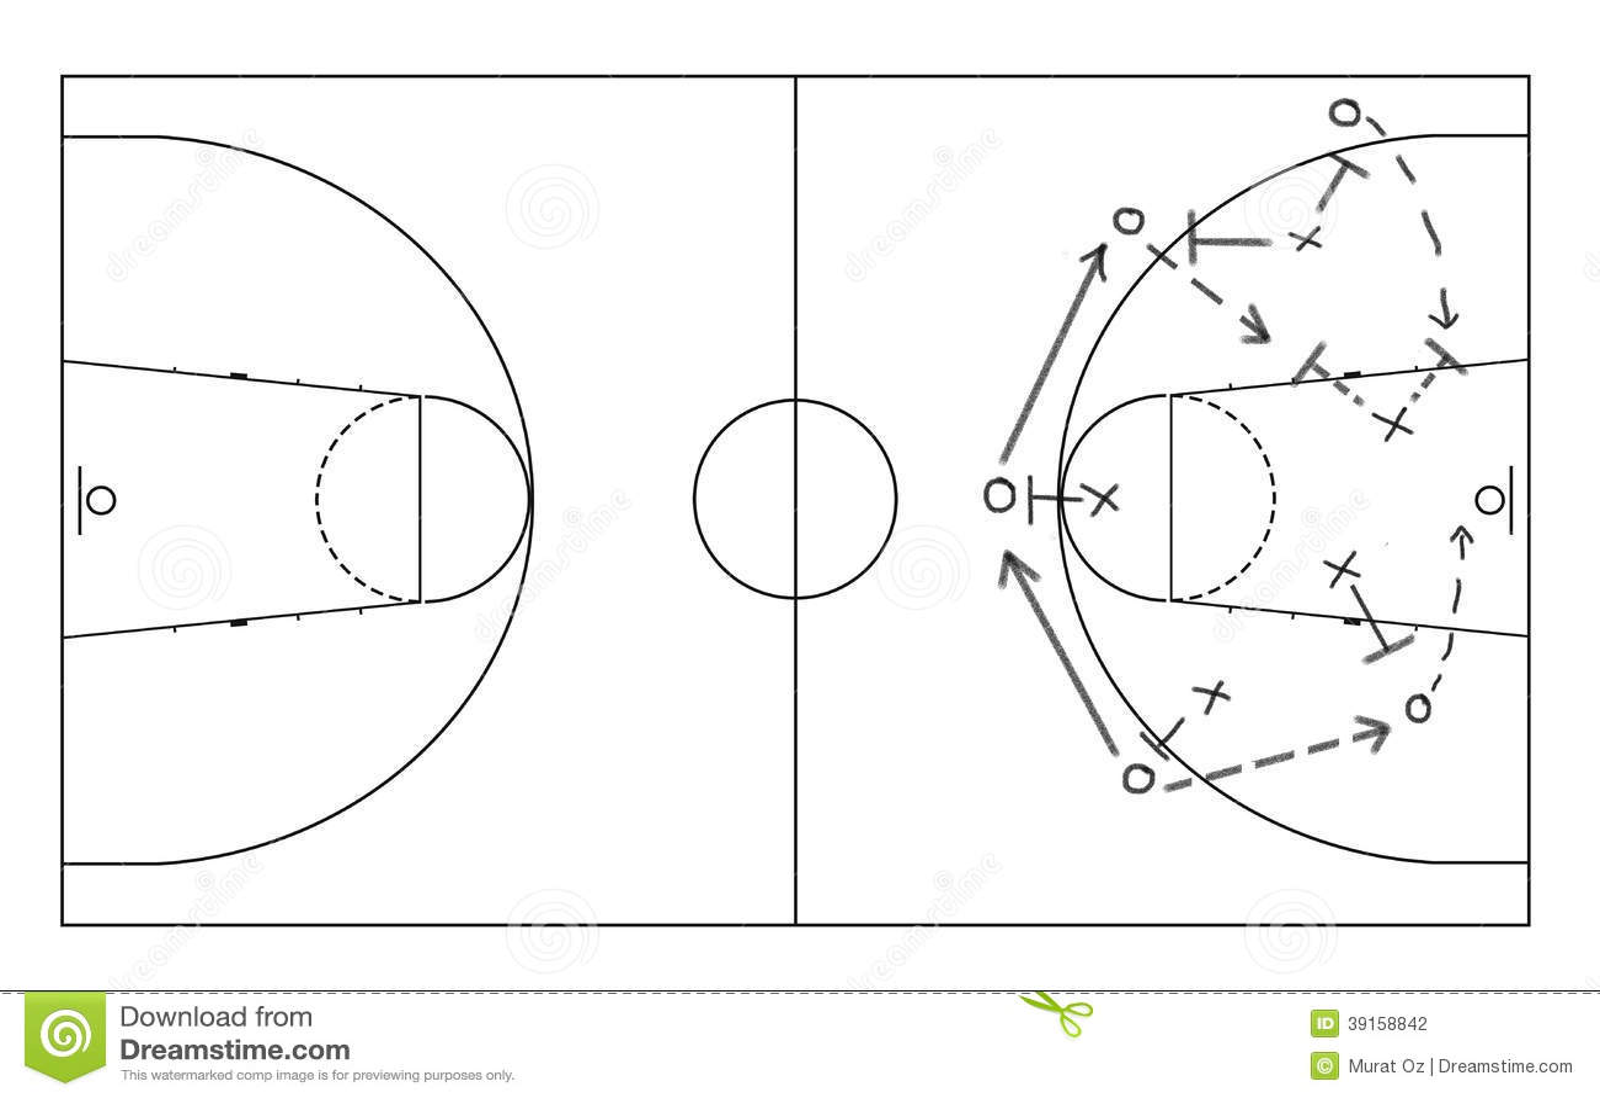 Basketball Whiteboard Game strategy drawn on white board stock photo ...